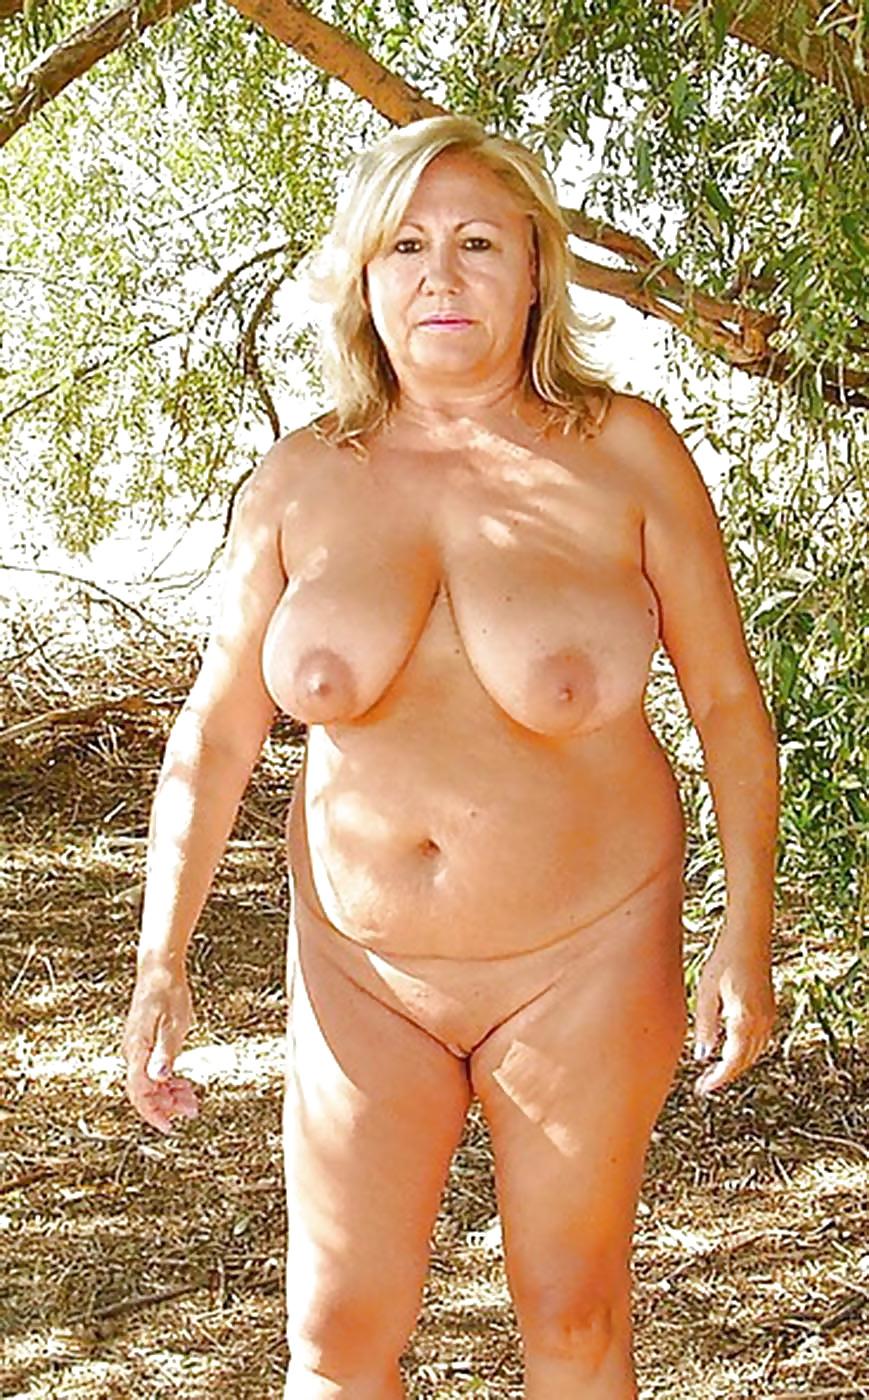 blonde hillbilly girls nude